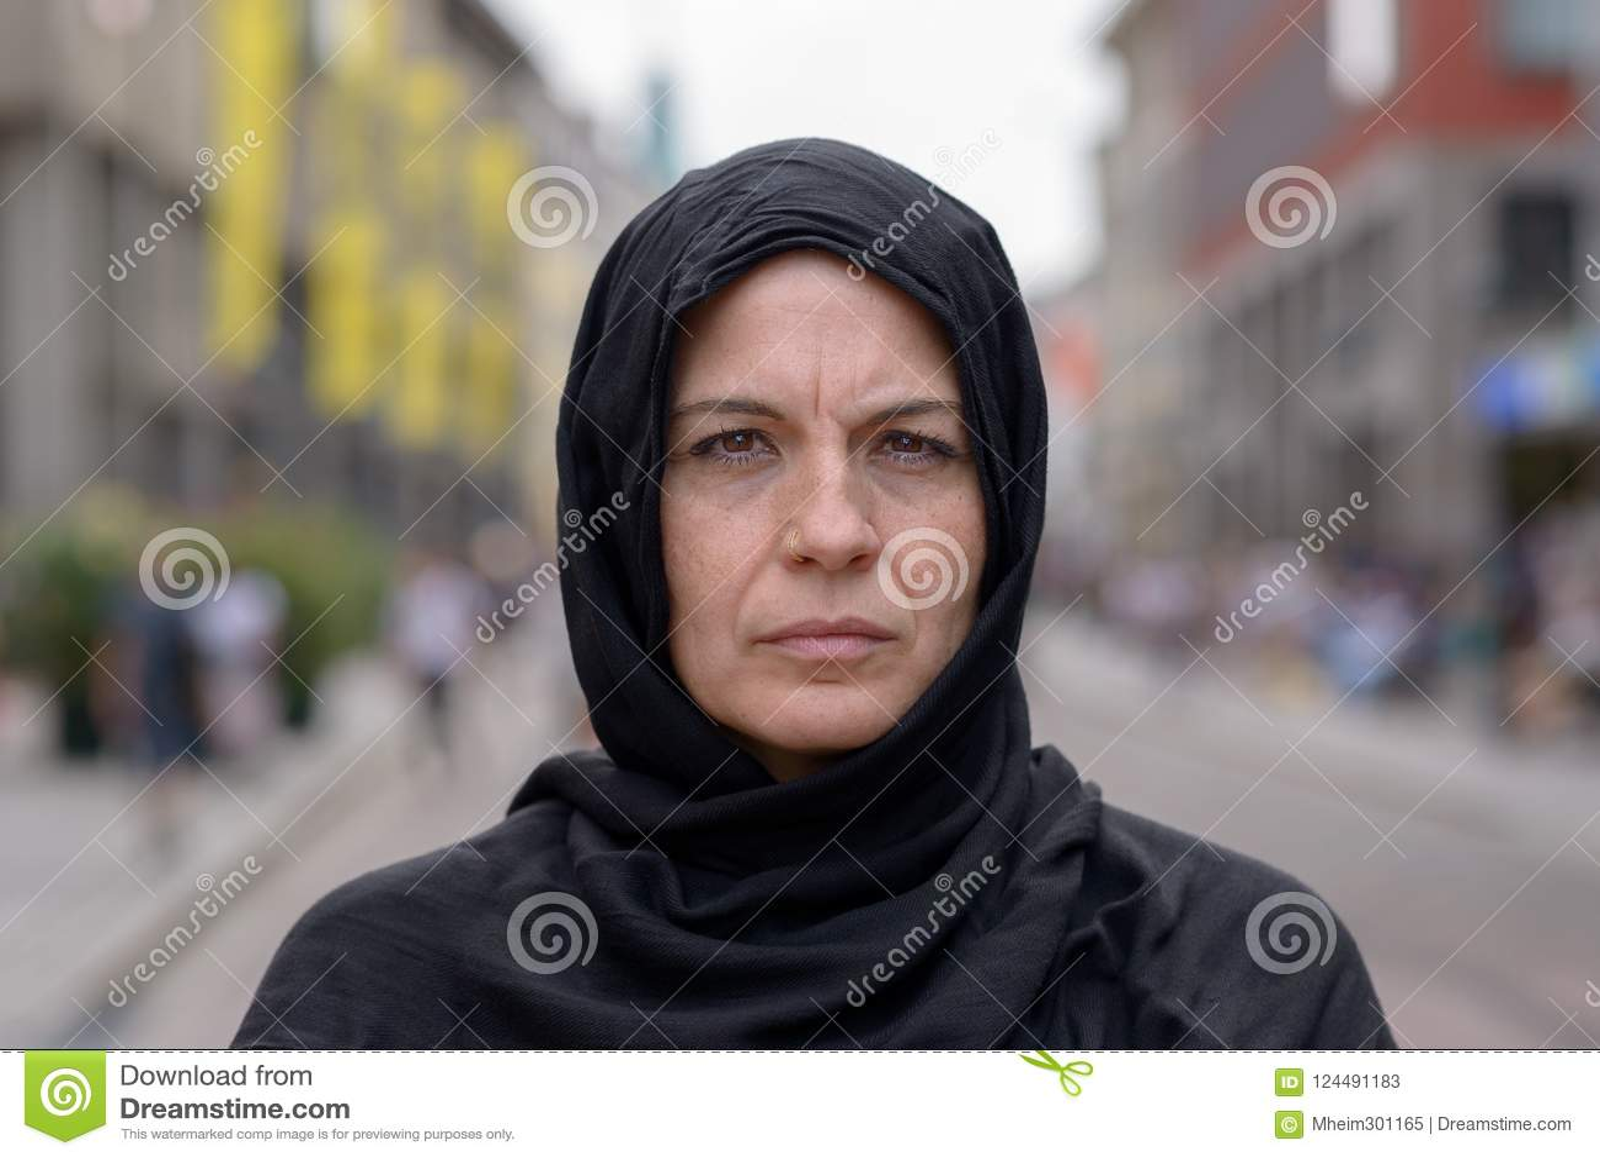 Woman wearing a head scarf in an urban street